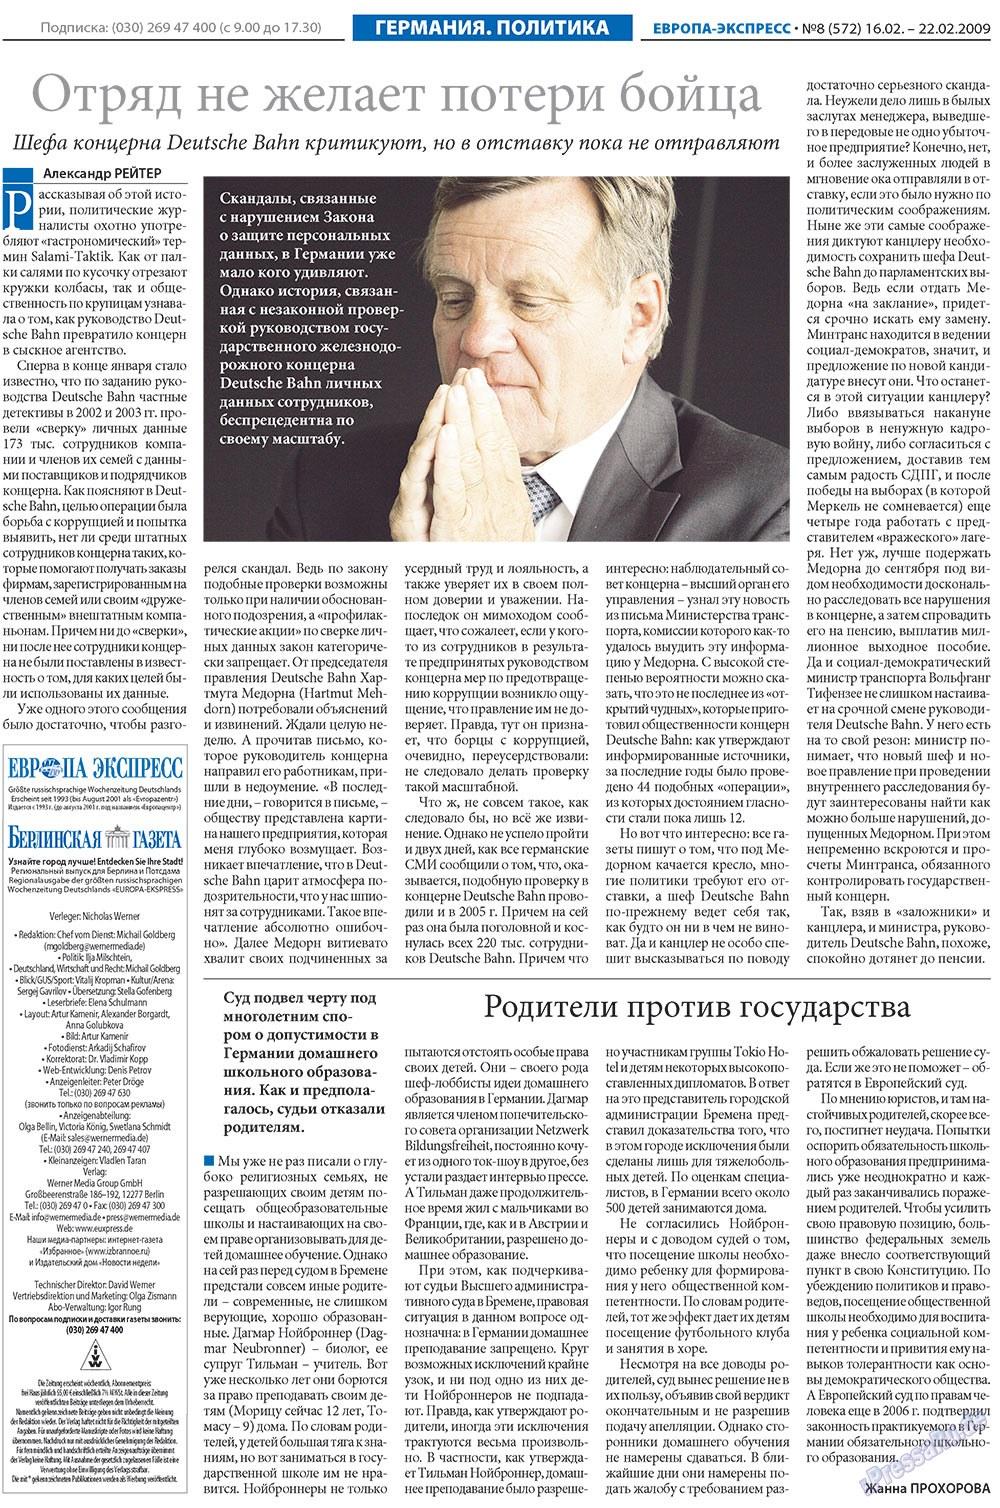 Европа экспресс (газета). 2009 год, номер 8, стр. 2